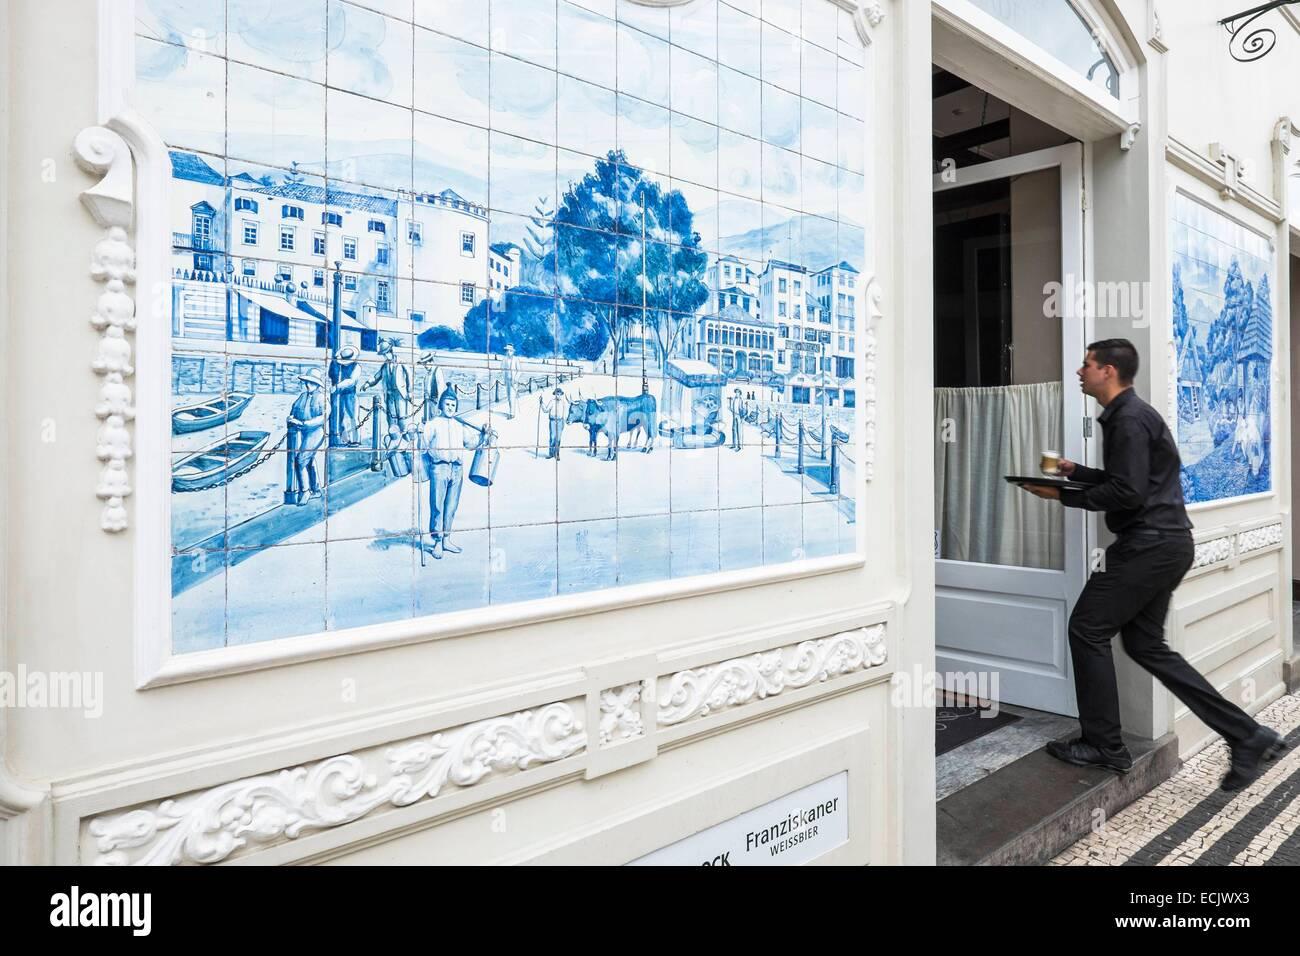 Portugal, Madeira island, Funchal, azulejos of the Ritz Cafe on Avenida Arriaga - Stock Image